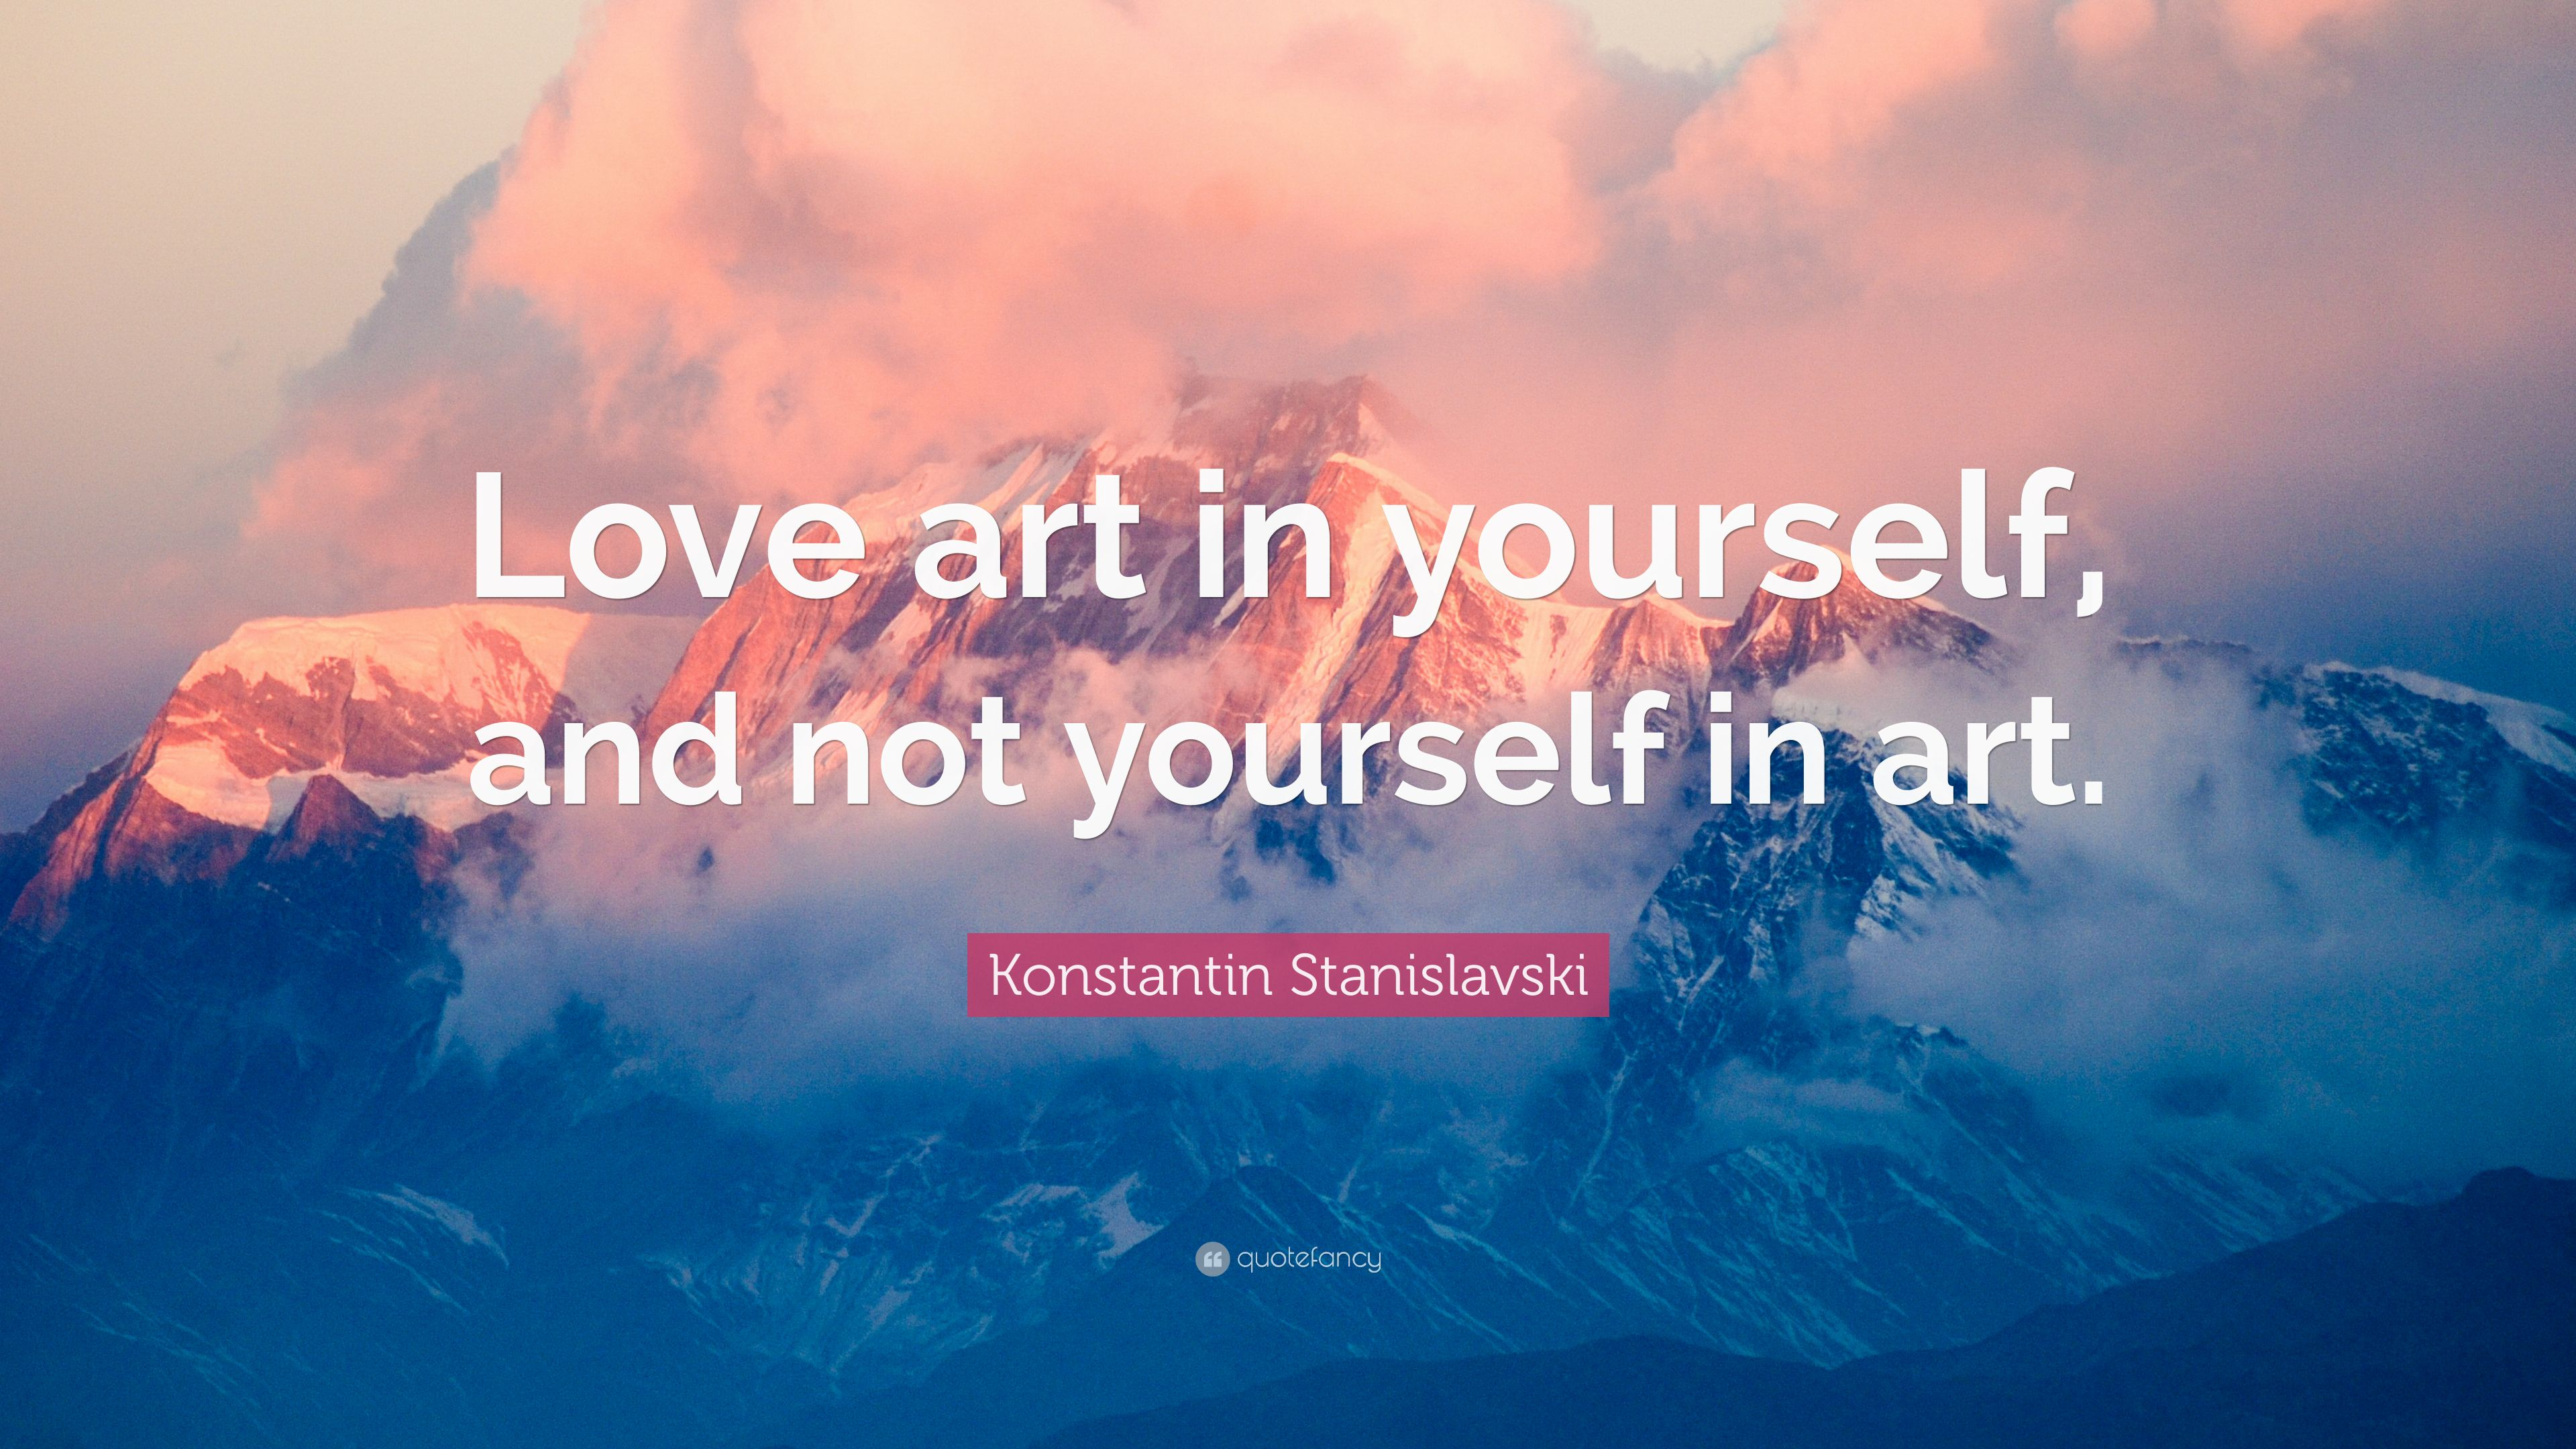 Konstantin Stanislavski Quote Love Art In Yourself And Not